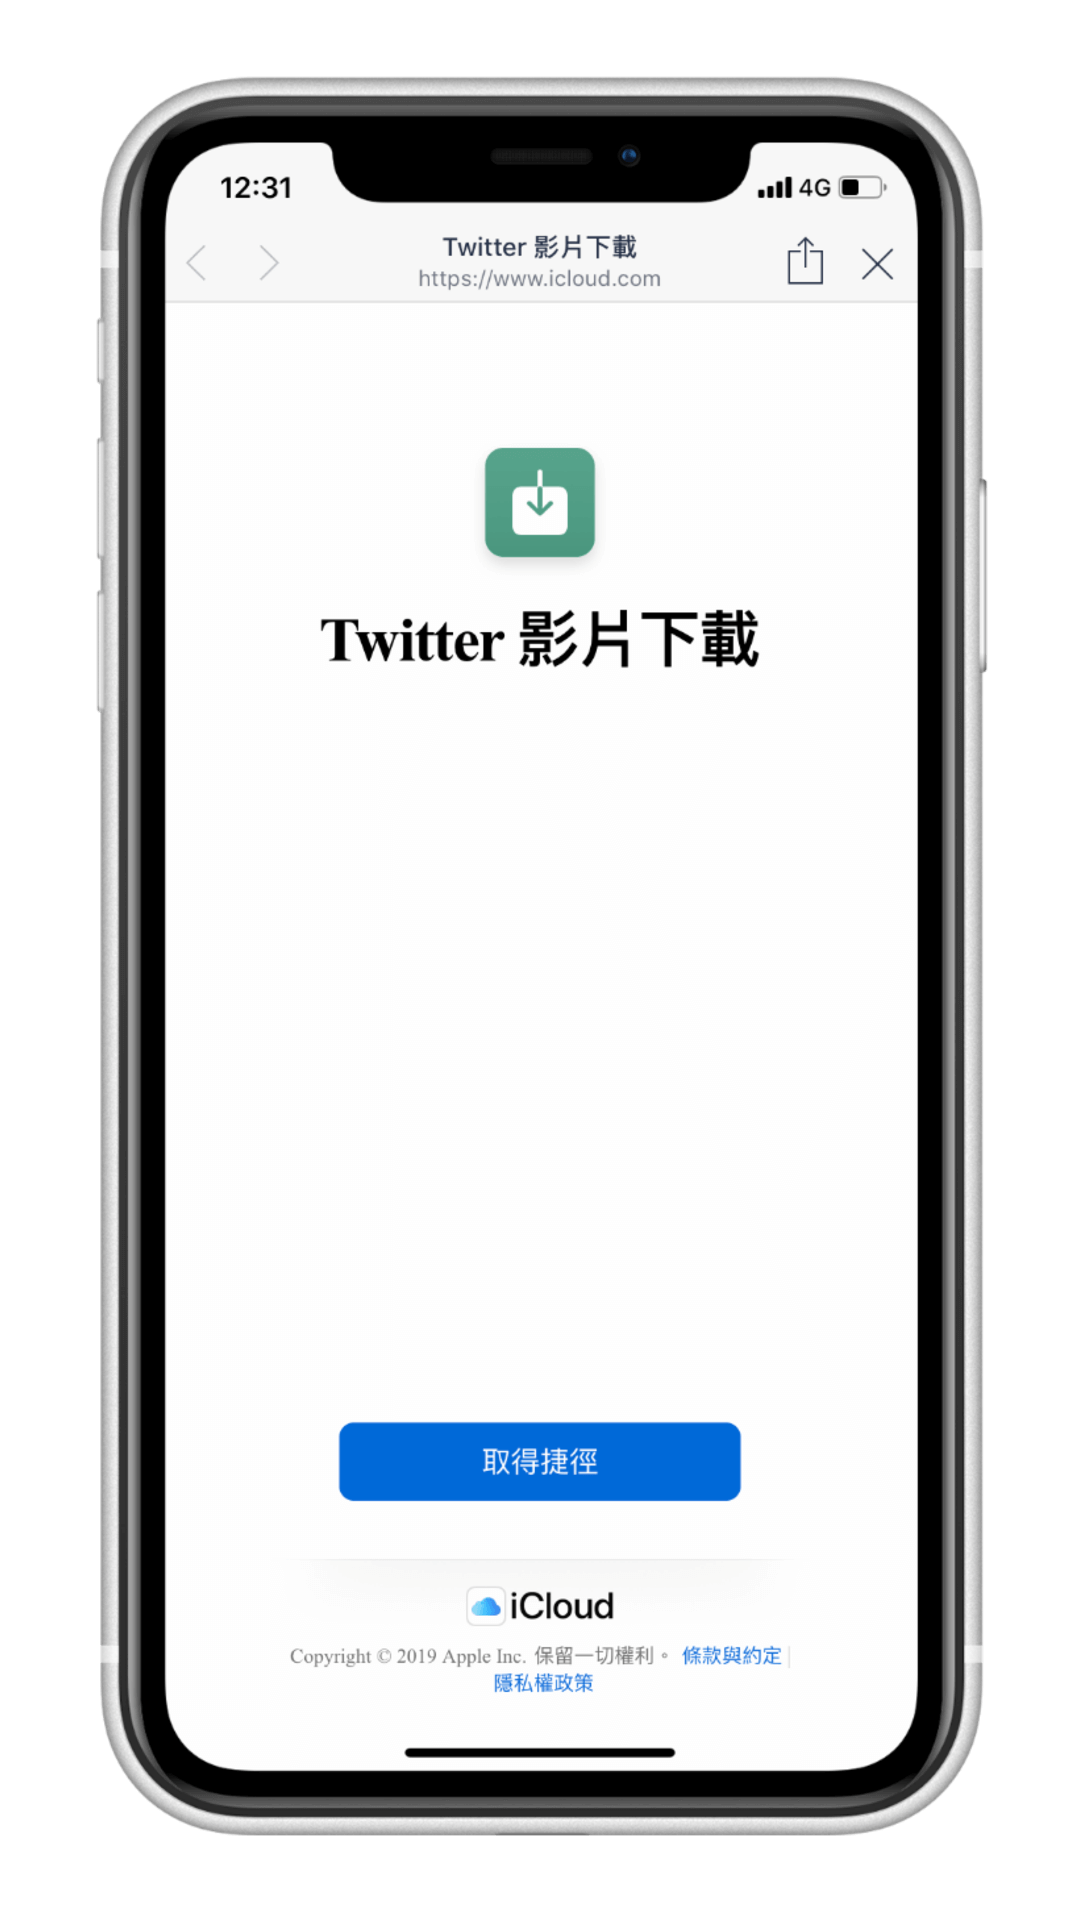 iPhone 3 秒下載推特影片/Twitter 影片下載 (iOS 捷徑教學)